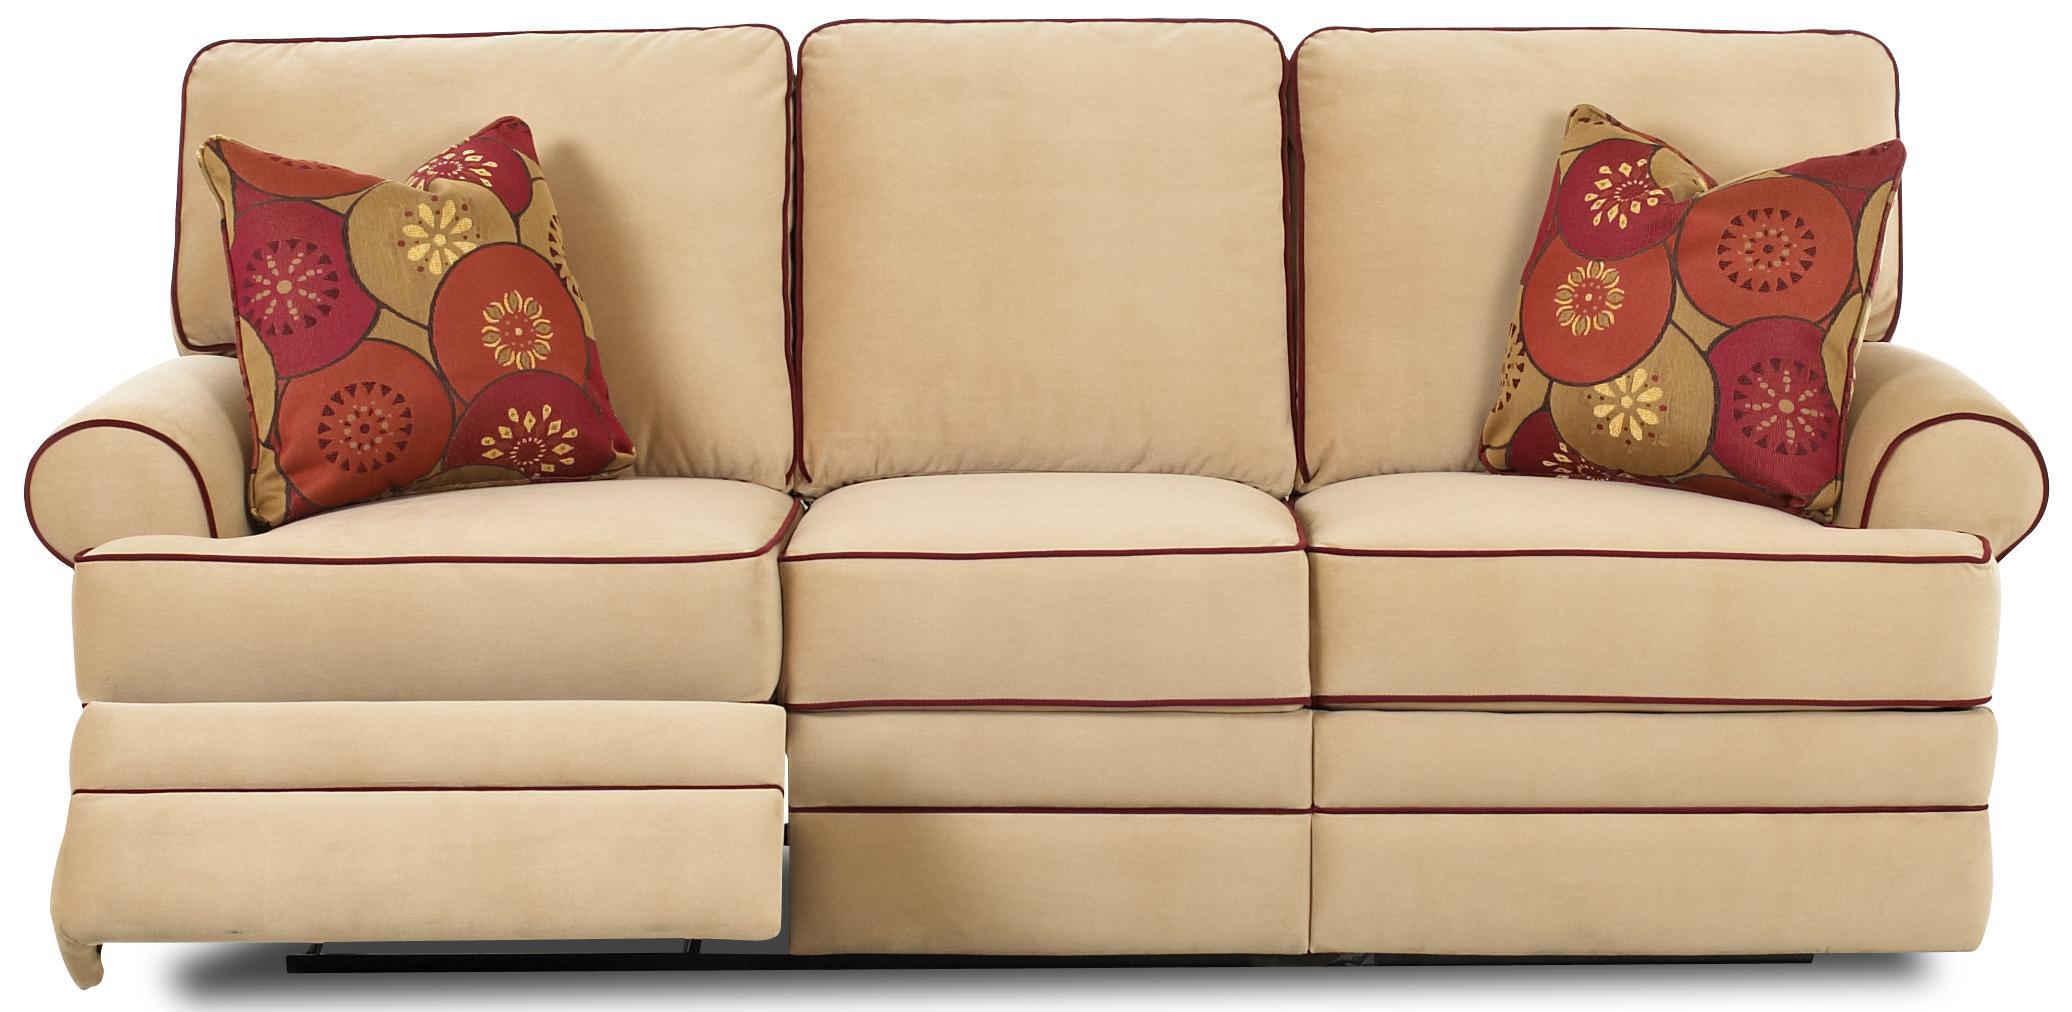 Klaussner Belleview Transitional Dual Reclining Sofa Johnny Janosik Reclining Sofas